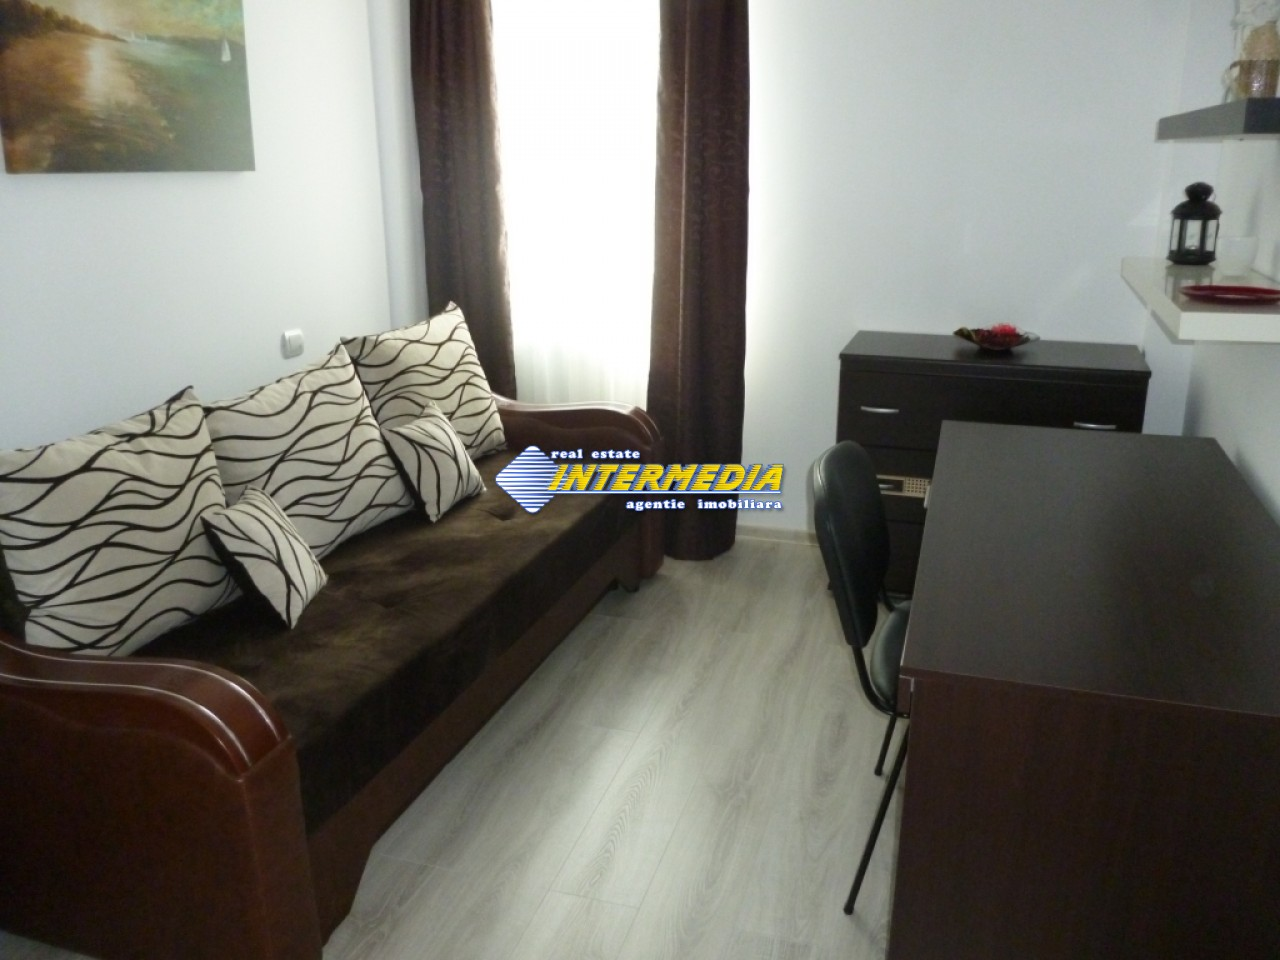 Apartament 4 camere de vanzare Alba Iulia Cetate Carolina 75.000 Euro-25931-10